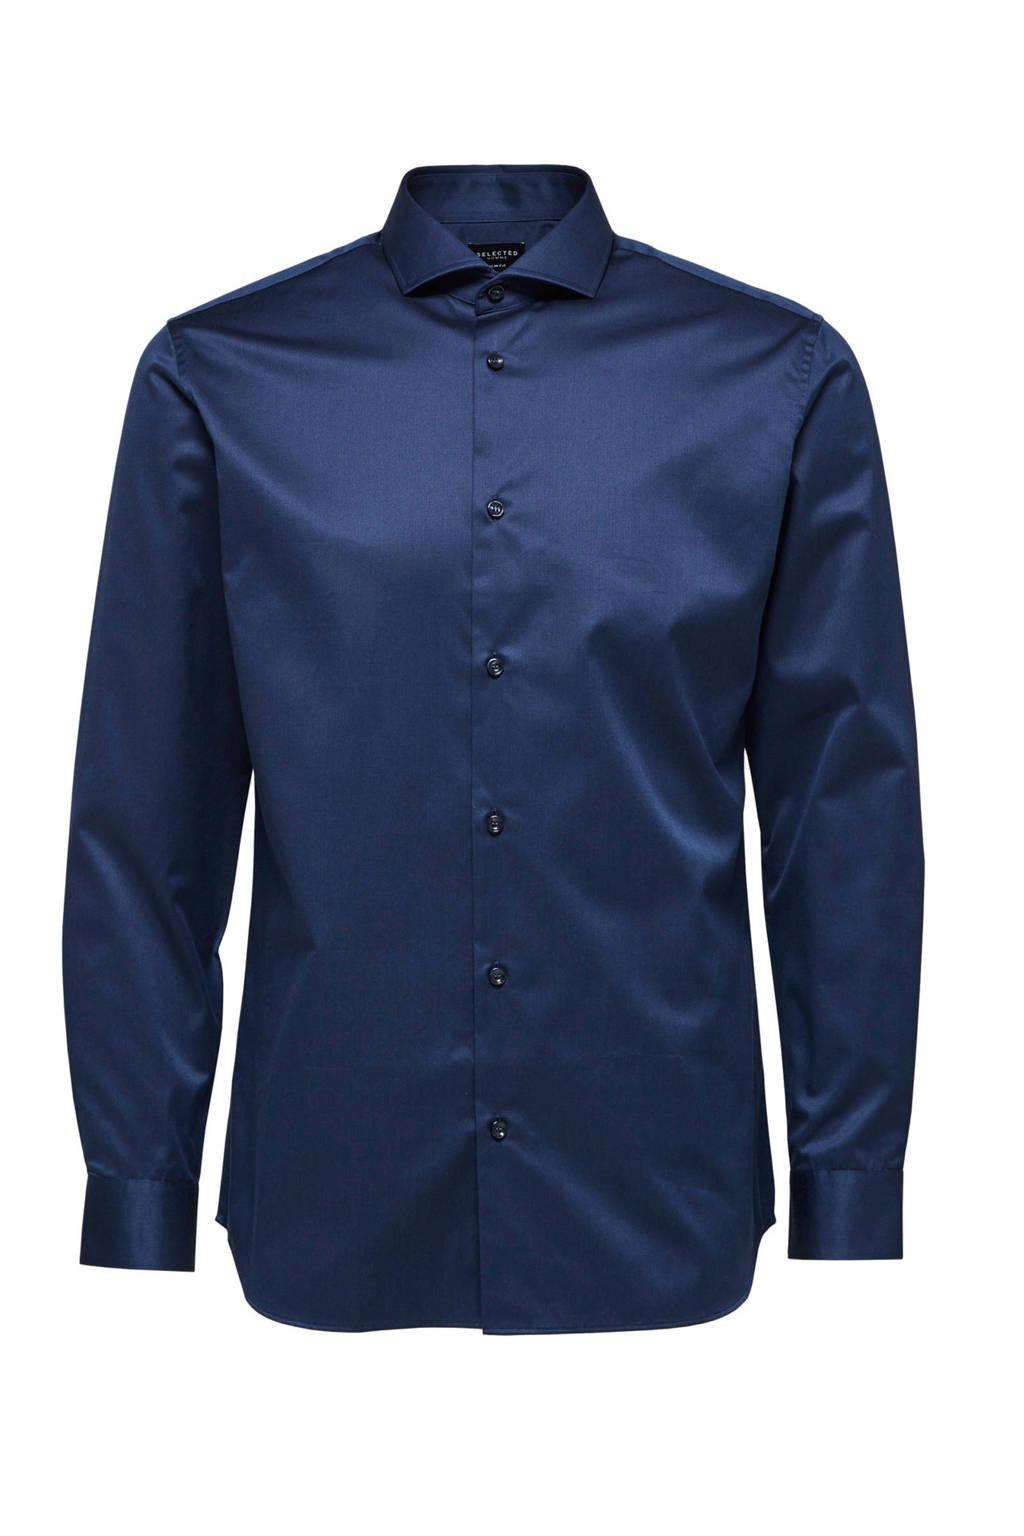 SELECTED HOMME overhemd, Donkerblauw